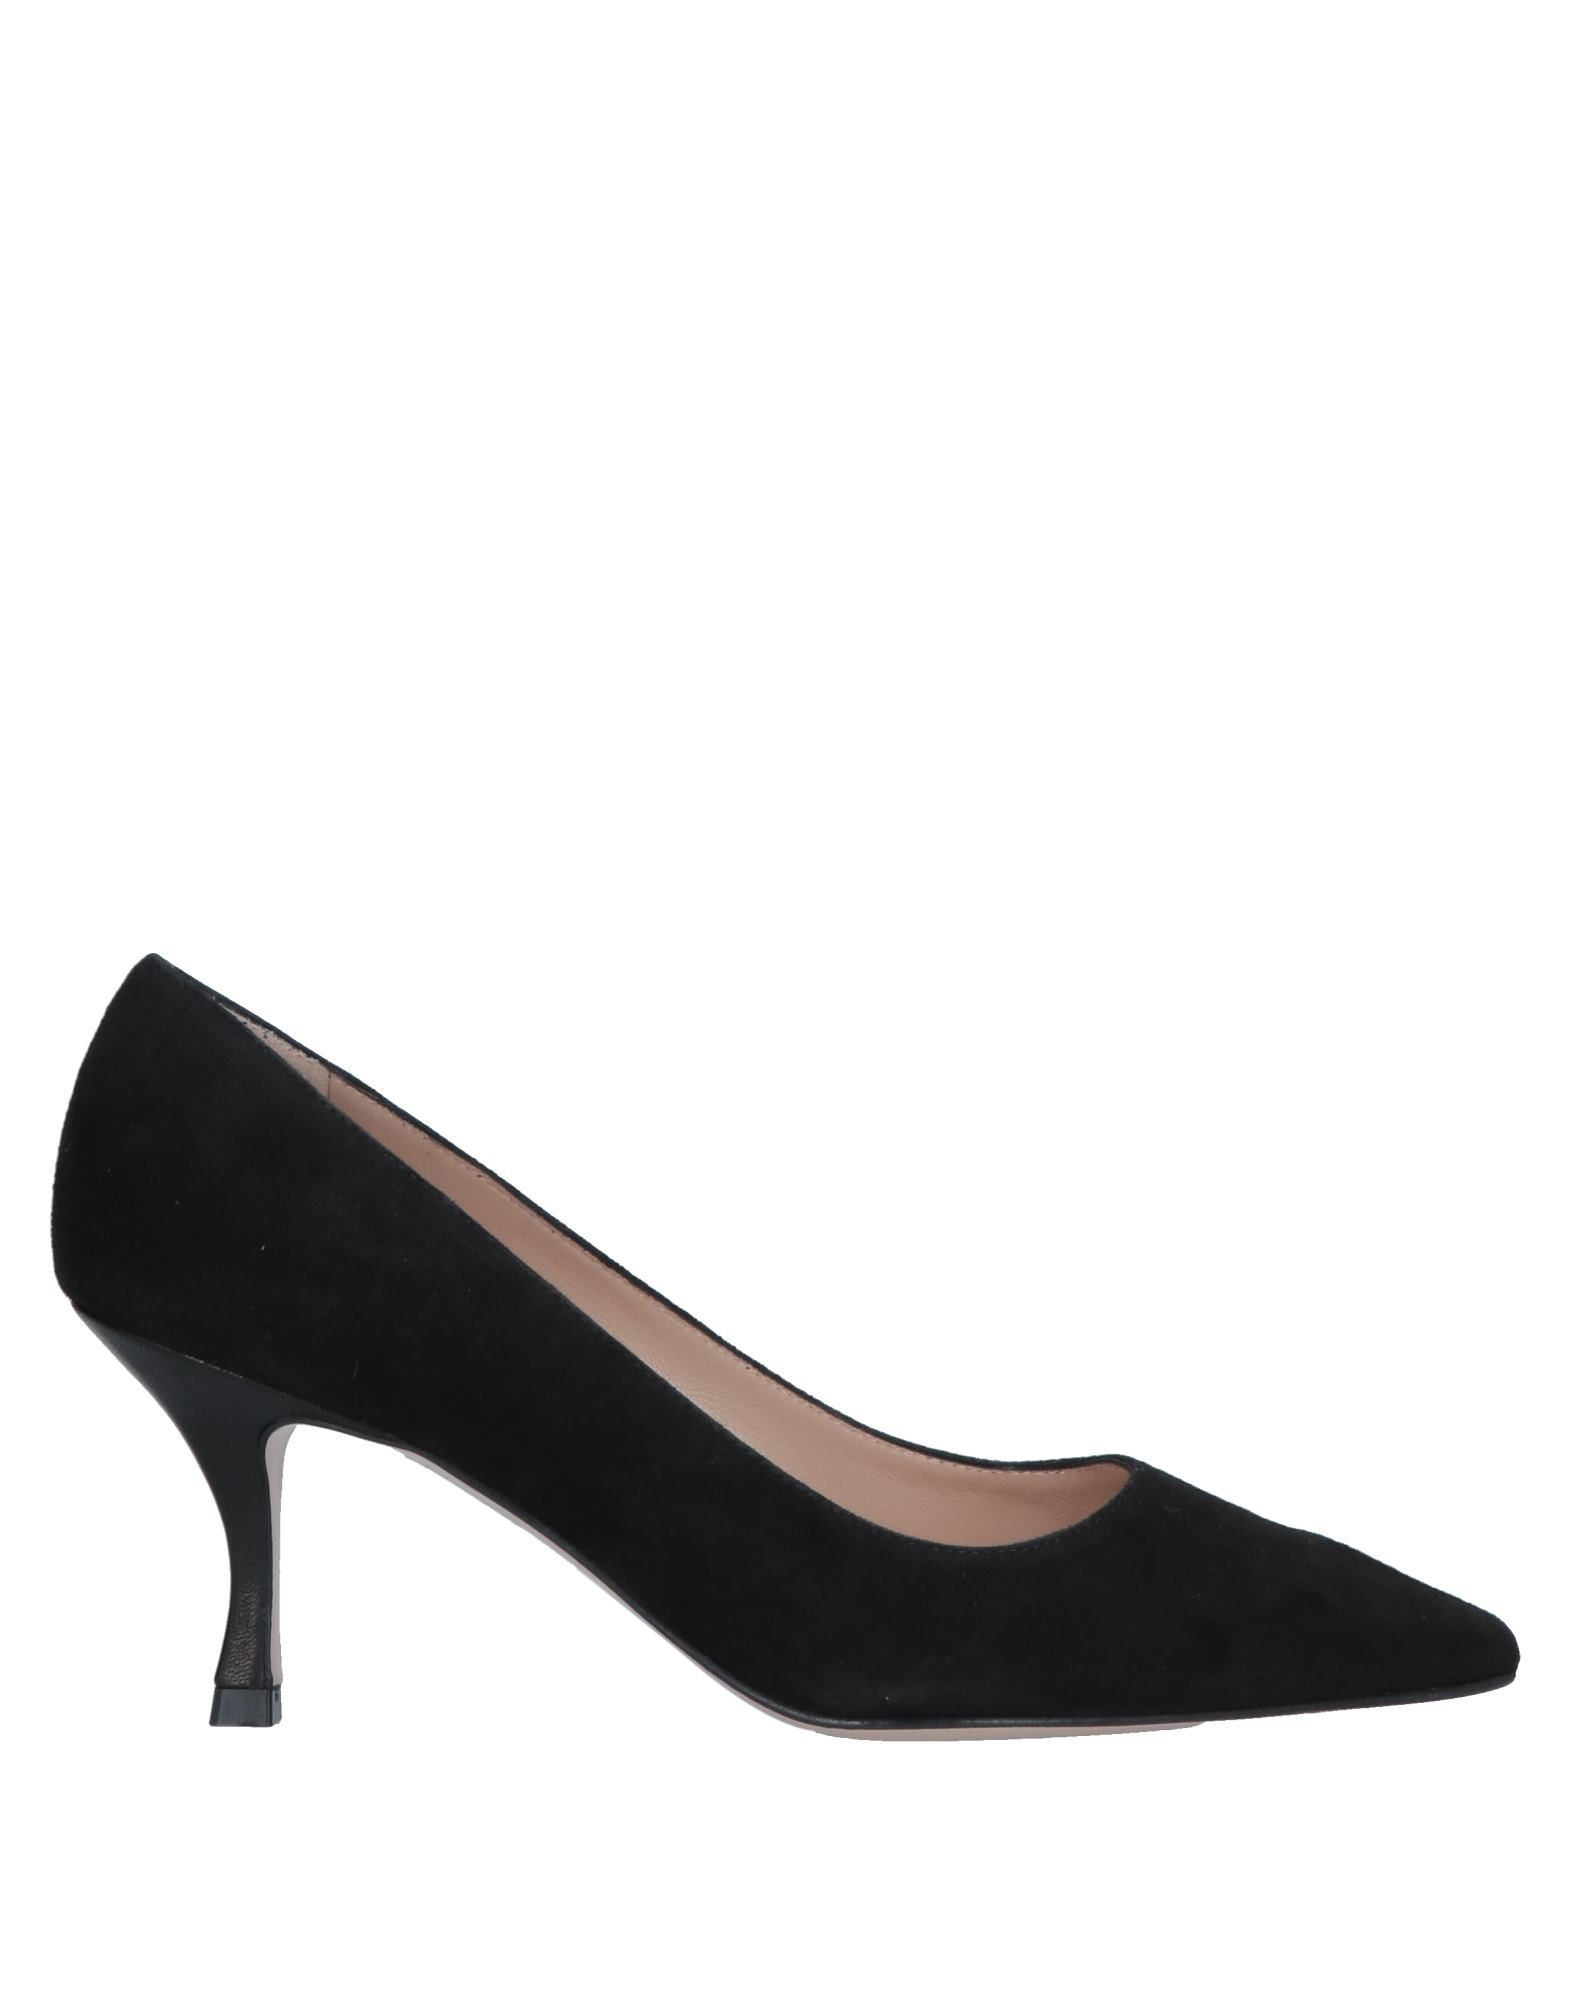 STUART WEITZMAN Туфли цены онлайн